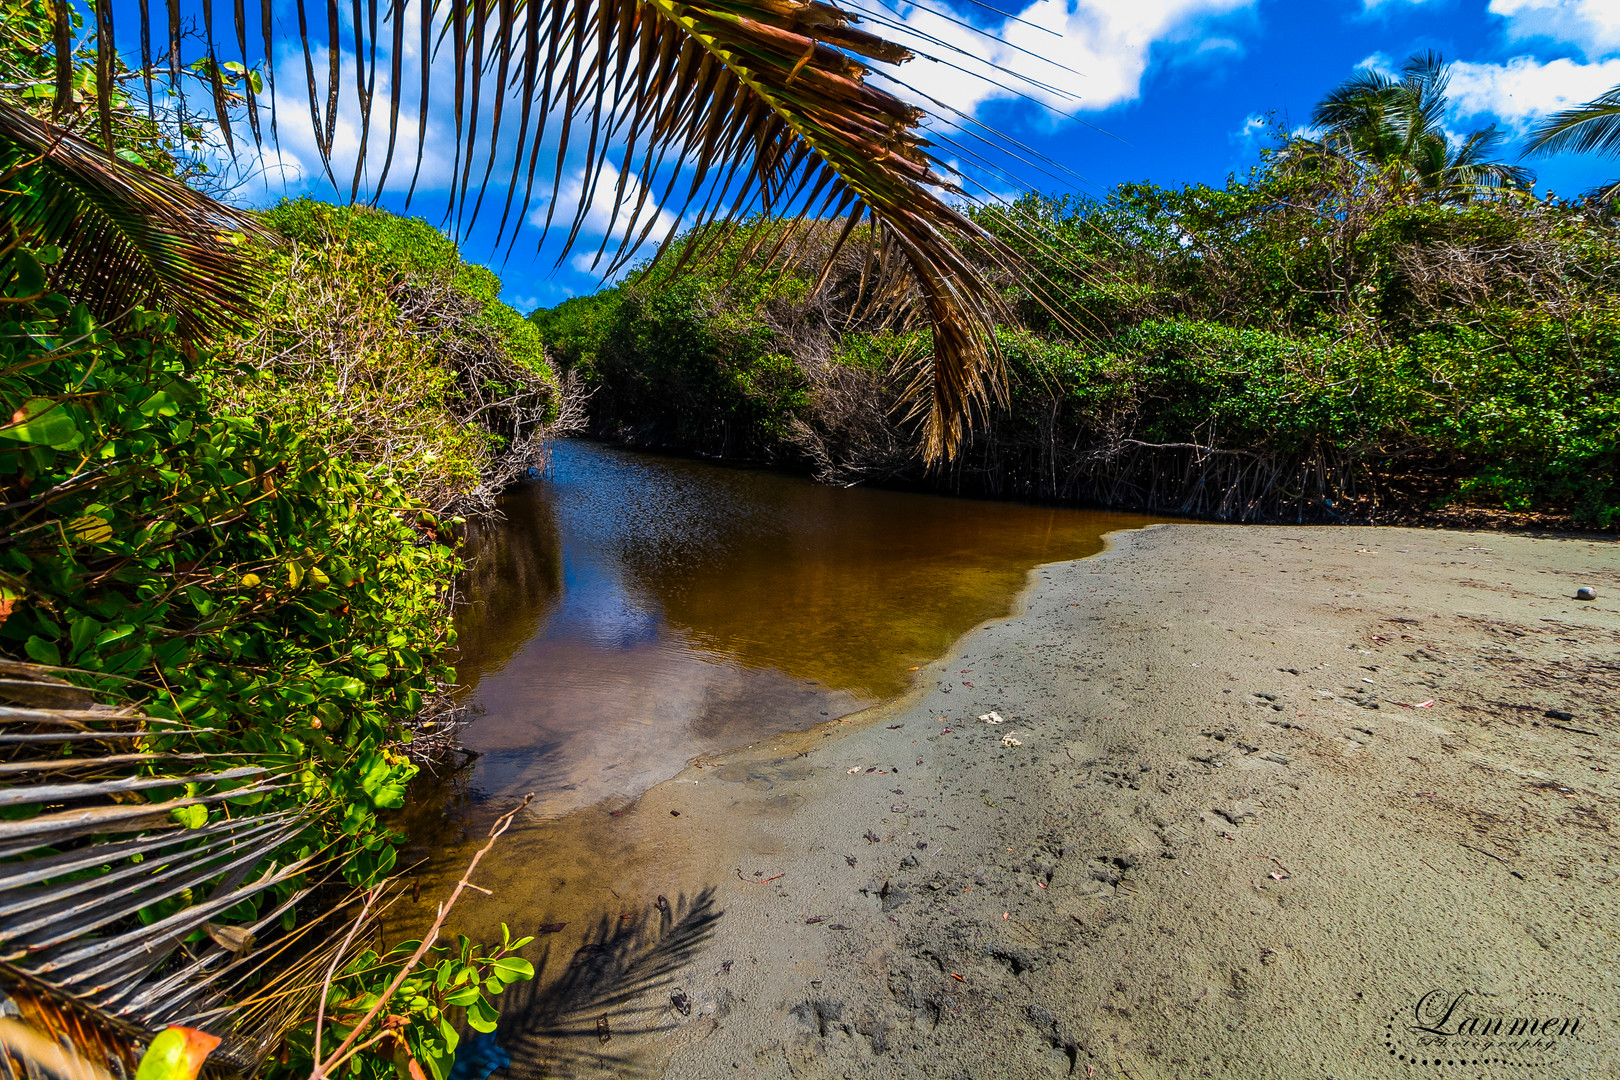 Saint Lucia Landscape Photogaphy Mangrov